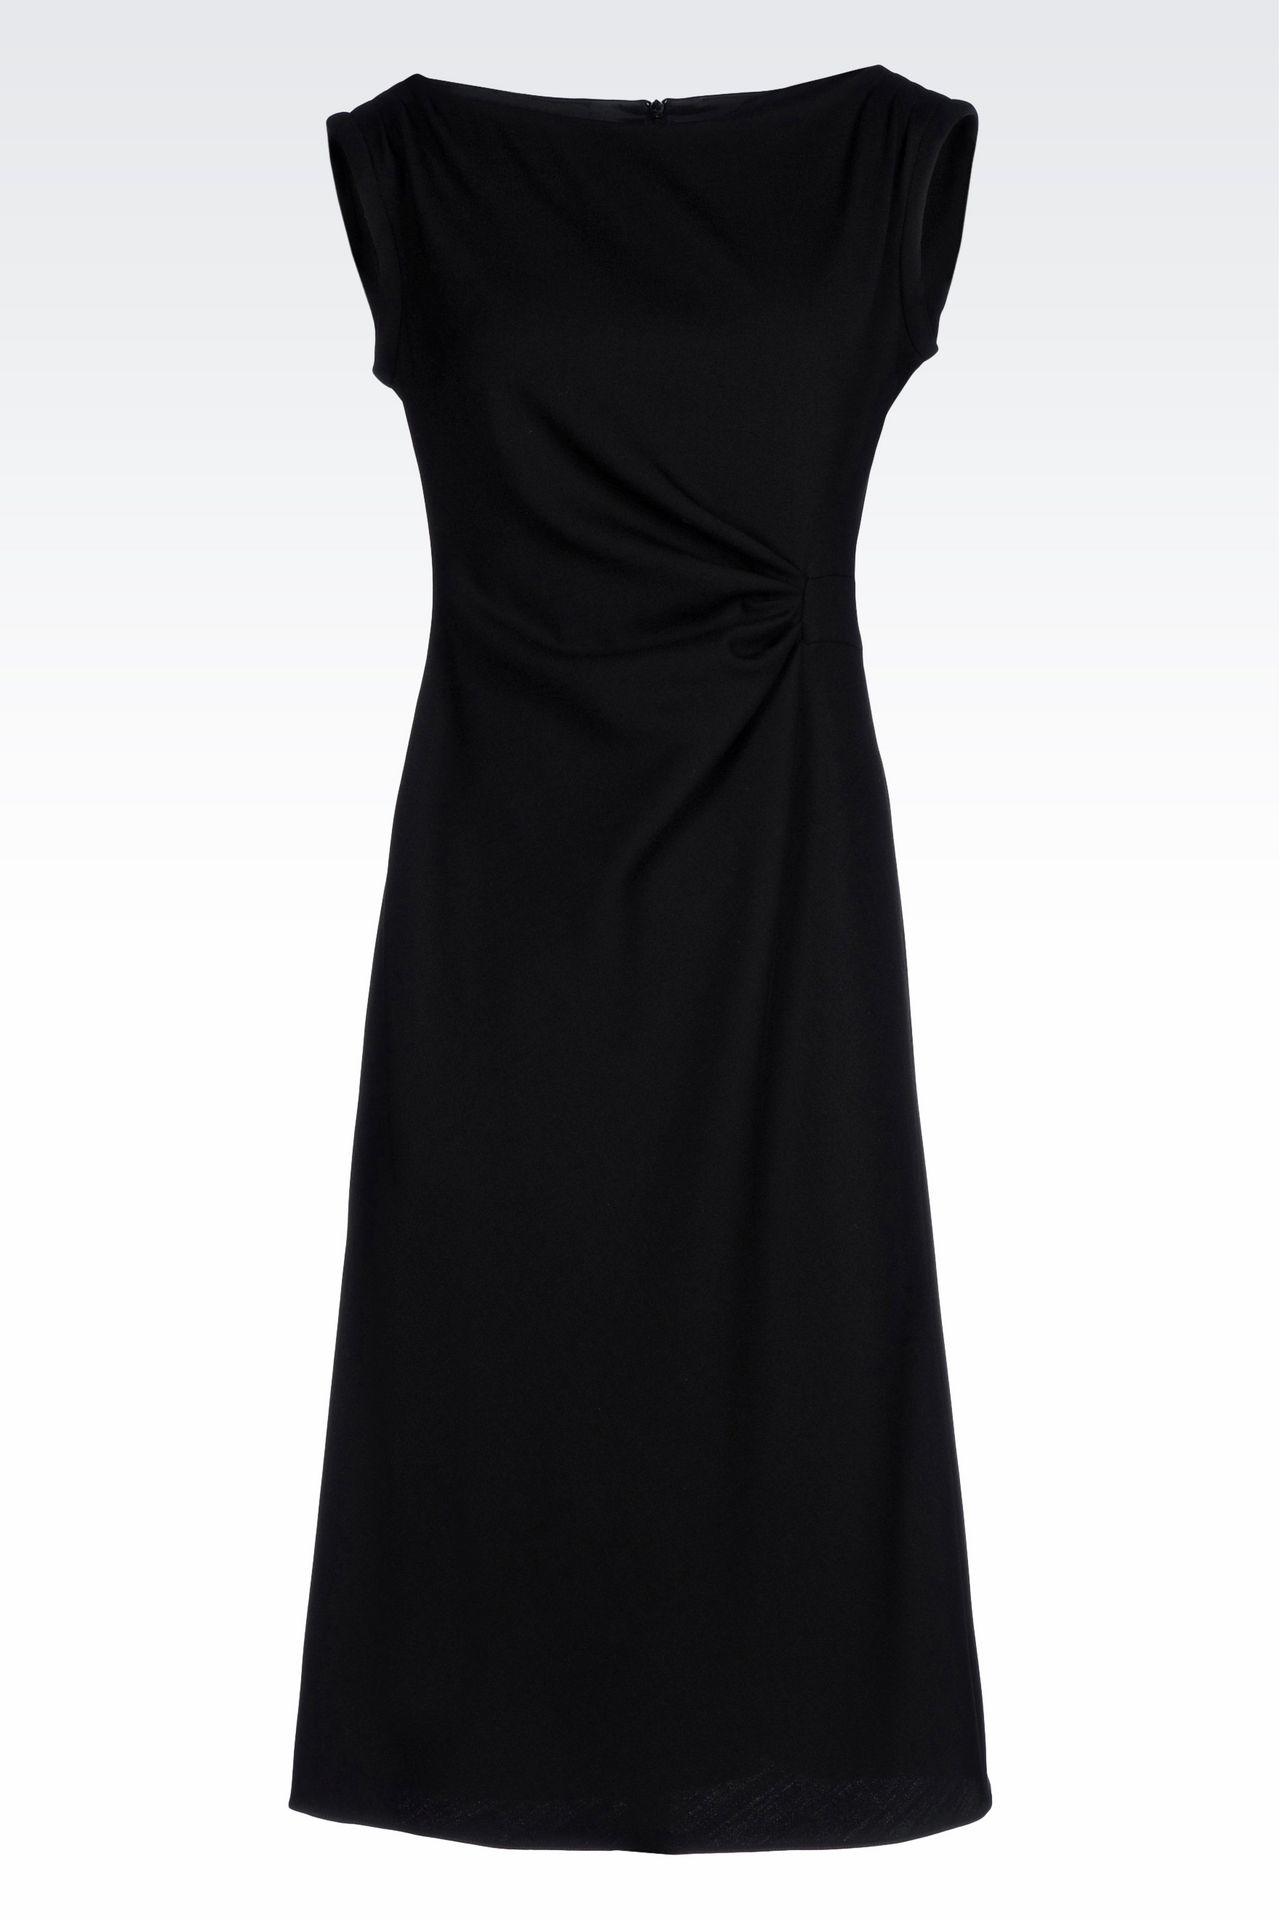 DRESS IN STRETCH WOOL: 3/4 Length Dresses Women by Armani - 0